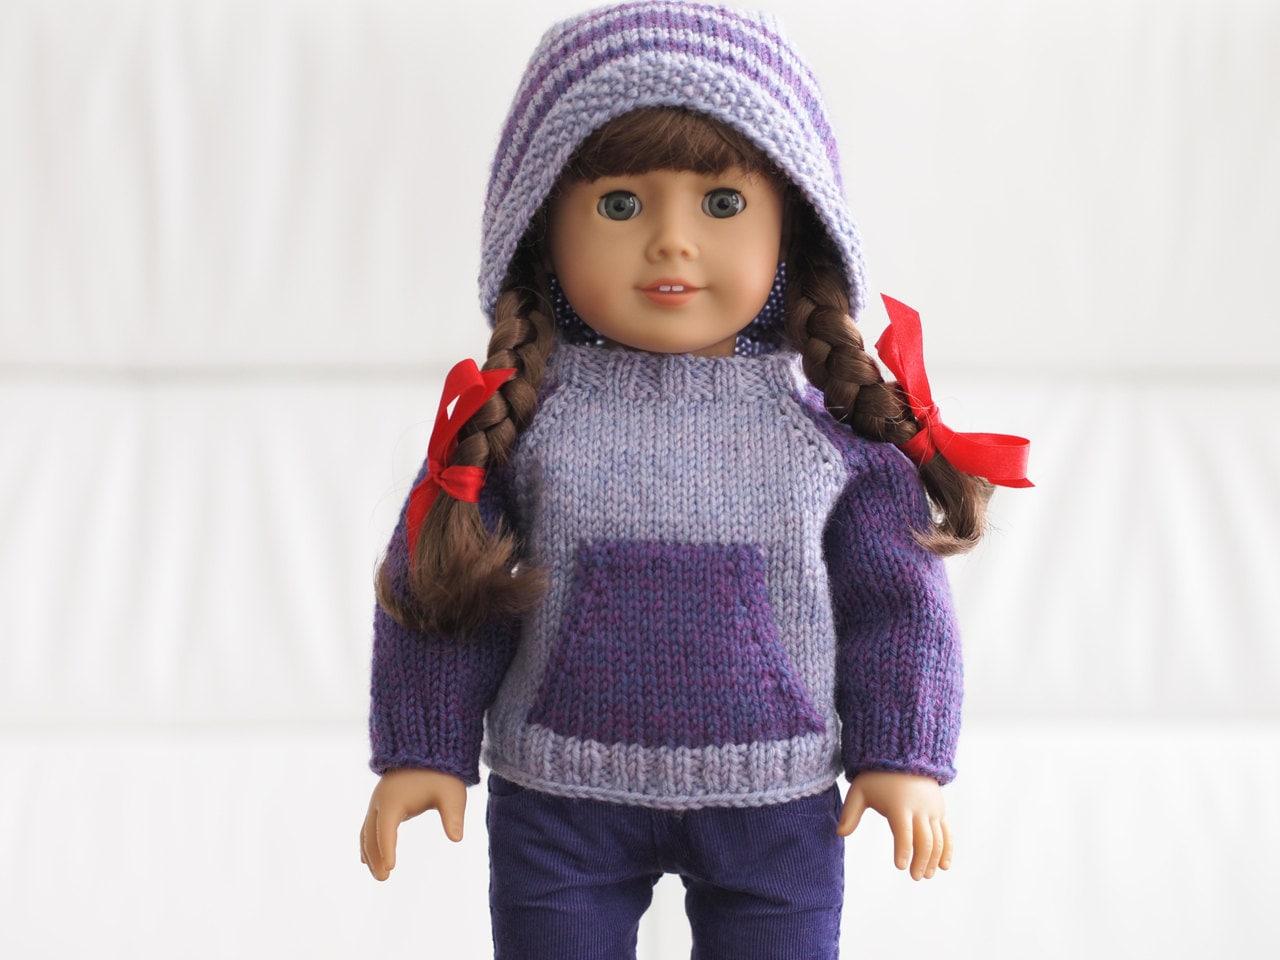 Kangaroo Campfire Hoodie Knitting Pattern for 18 Inch Dolls